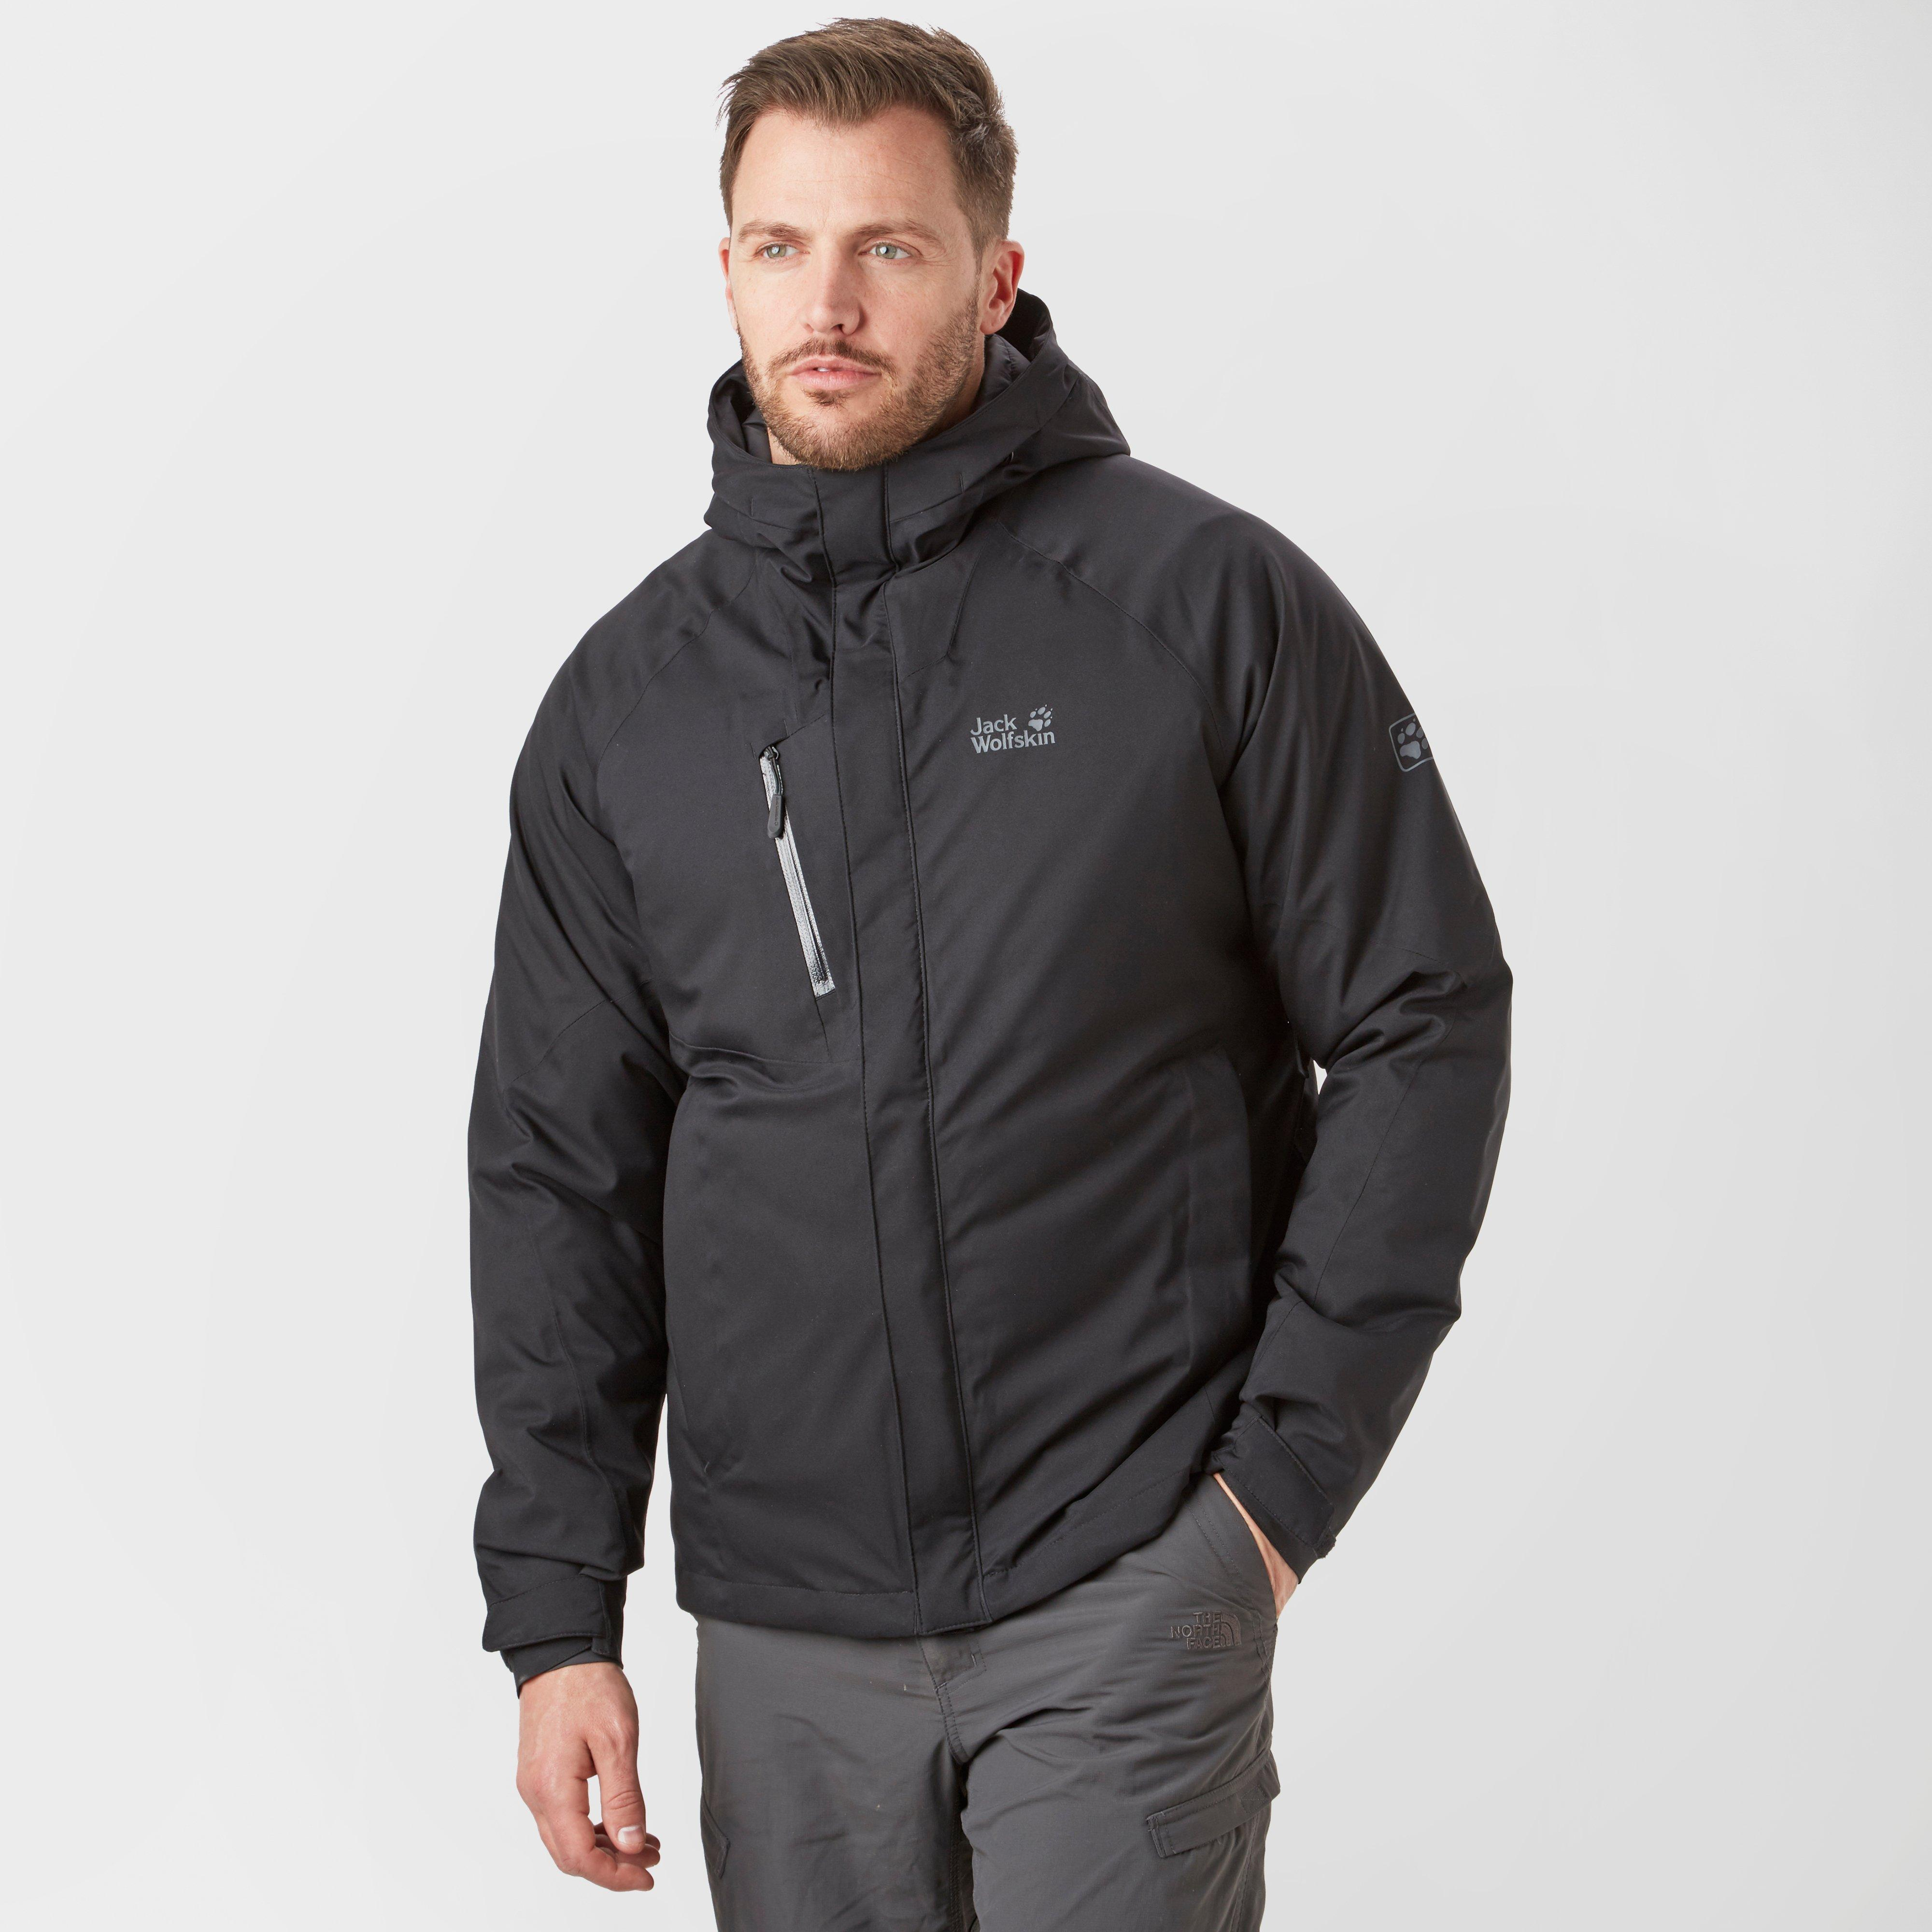 5507c2ec25 Jack Wolfskin Men's Troposphere Jacket, Black